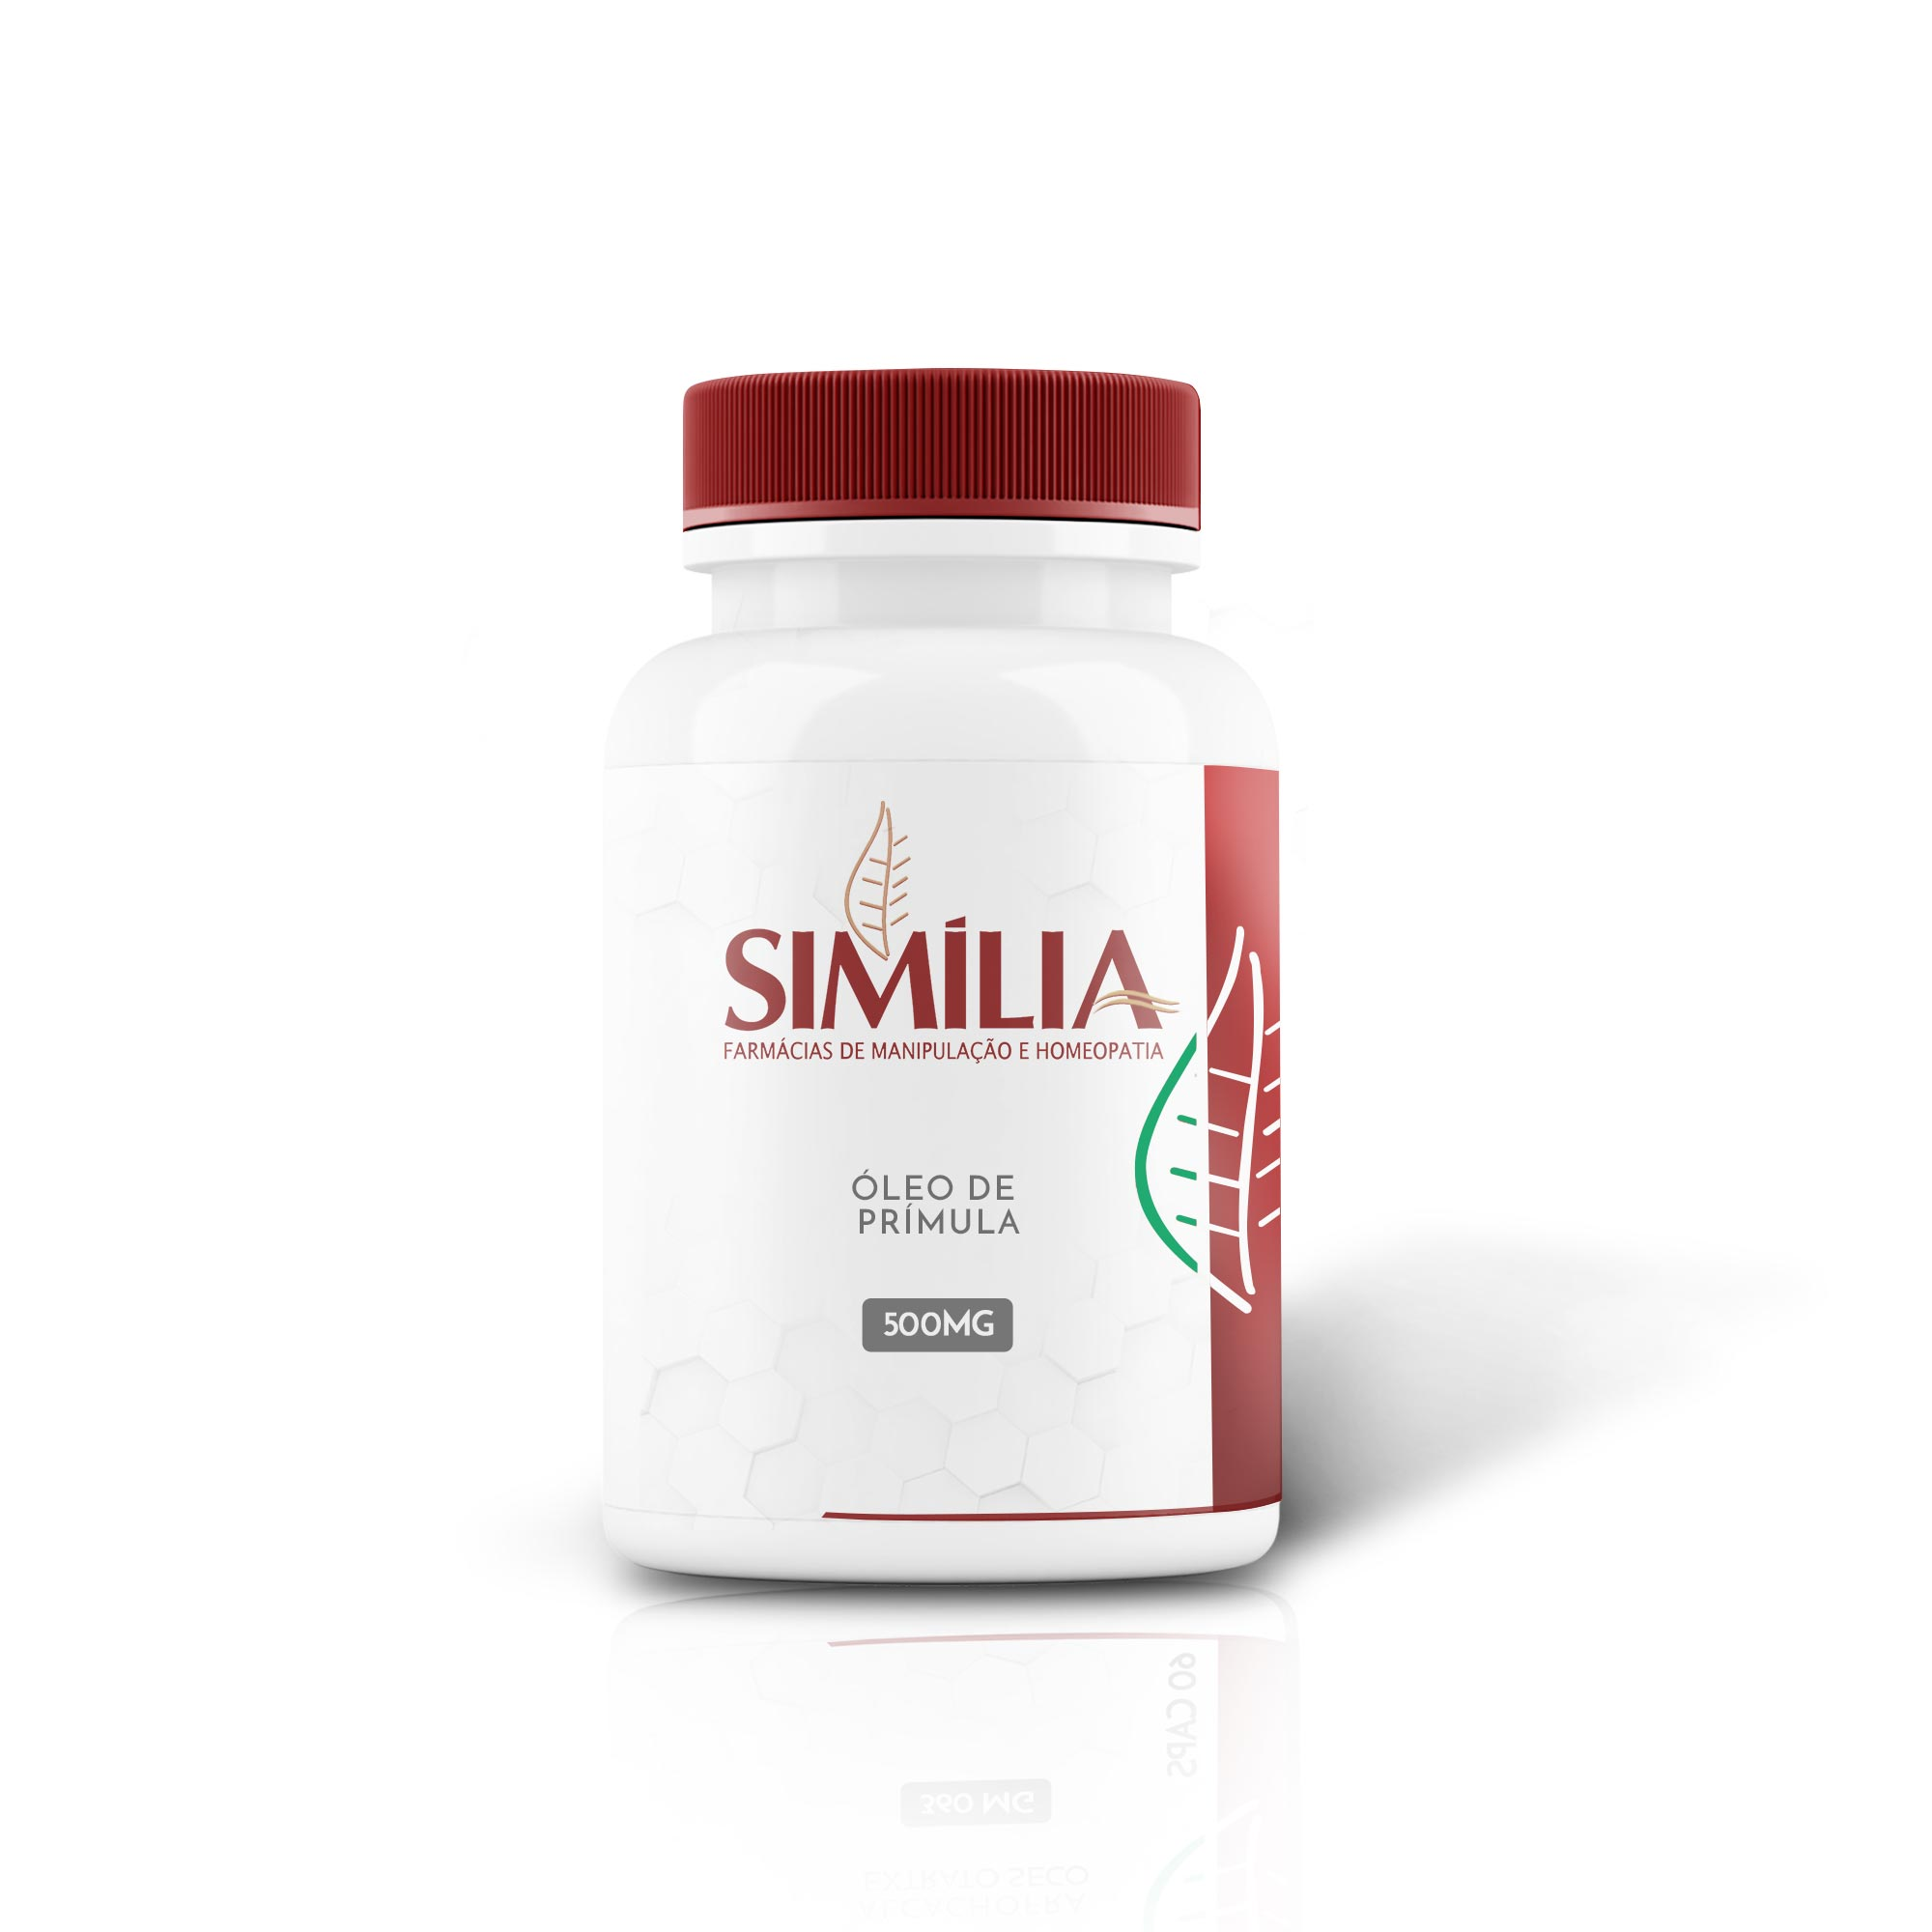 Óleo de Prímula 500Mg - Ácido Gama Linolênico - 100 cápsulas